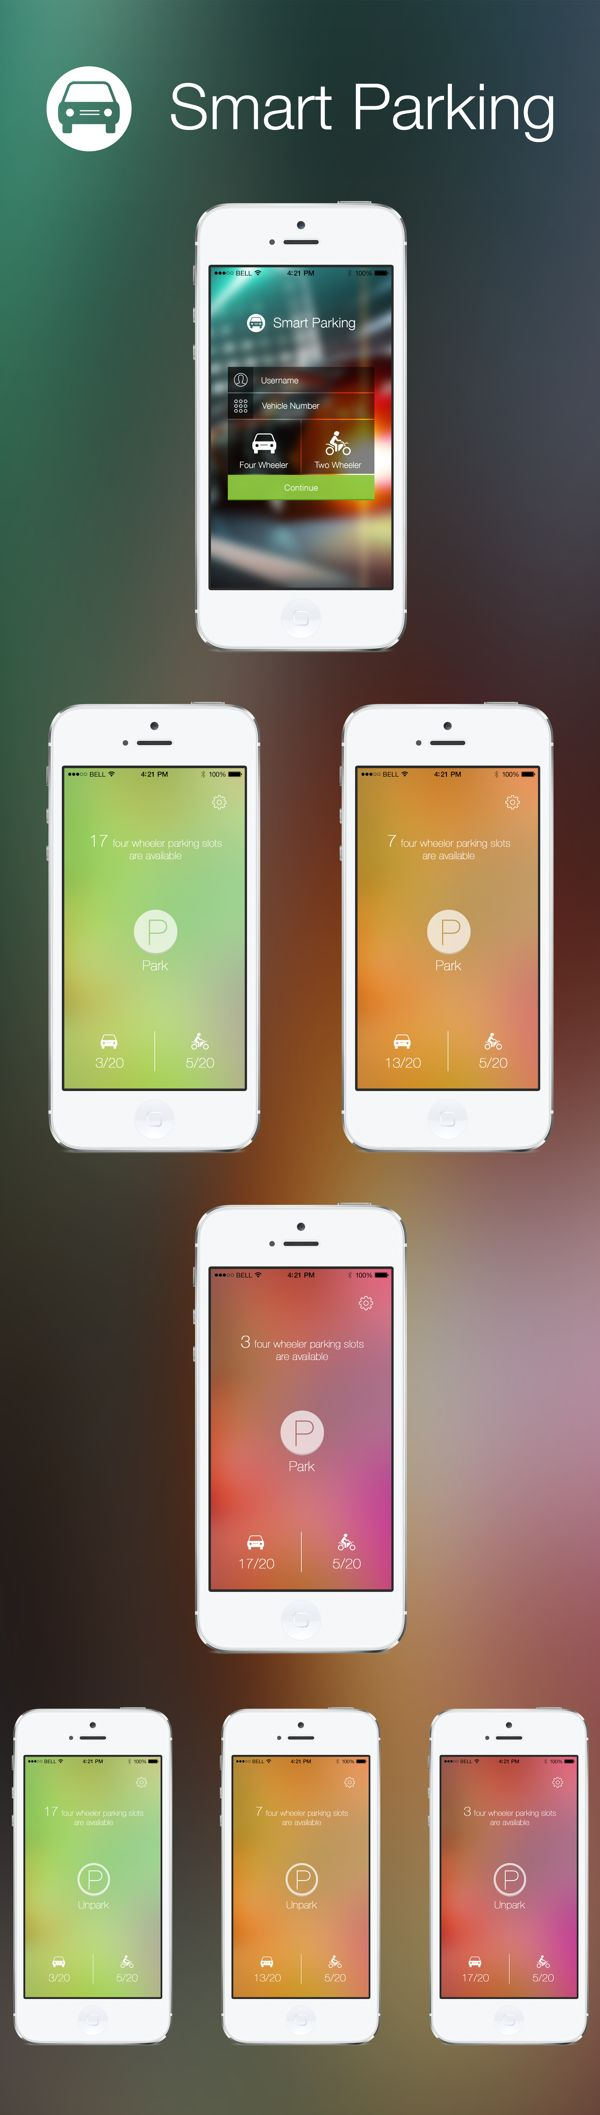 iOS 7 Parking App by Jagadeesh Punna, via Behance